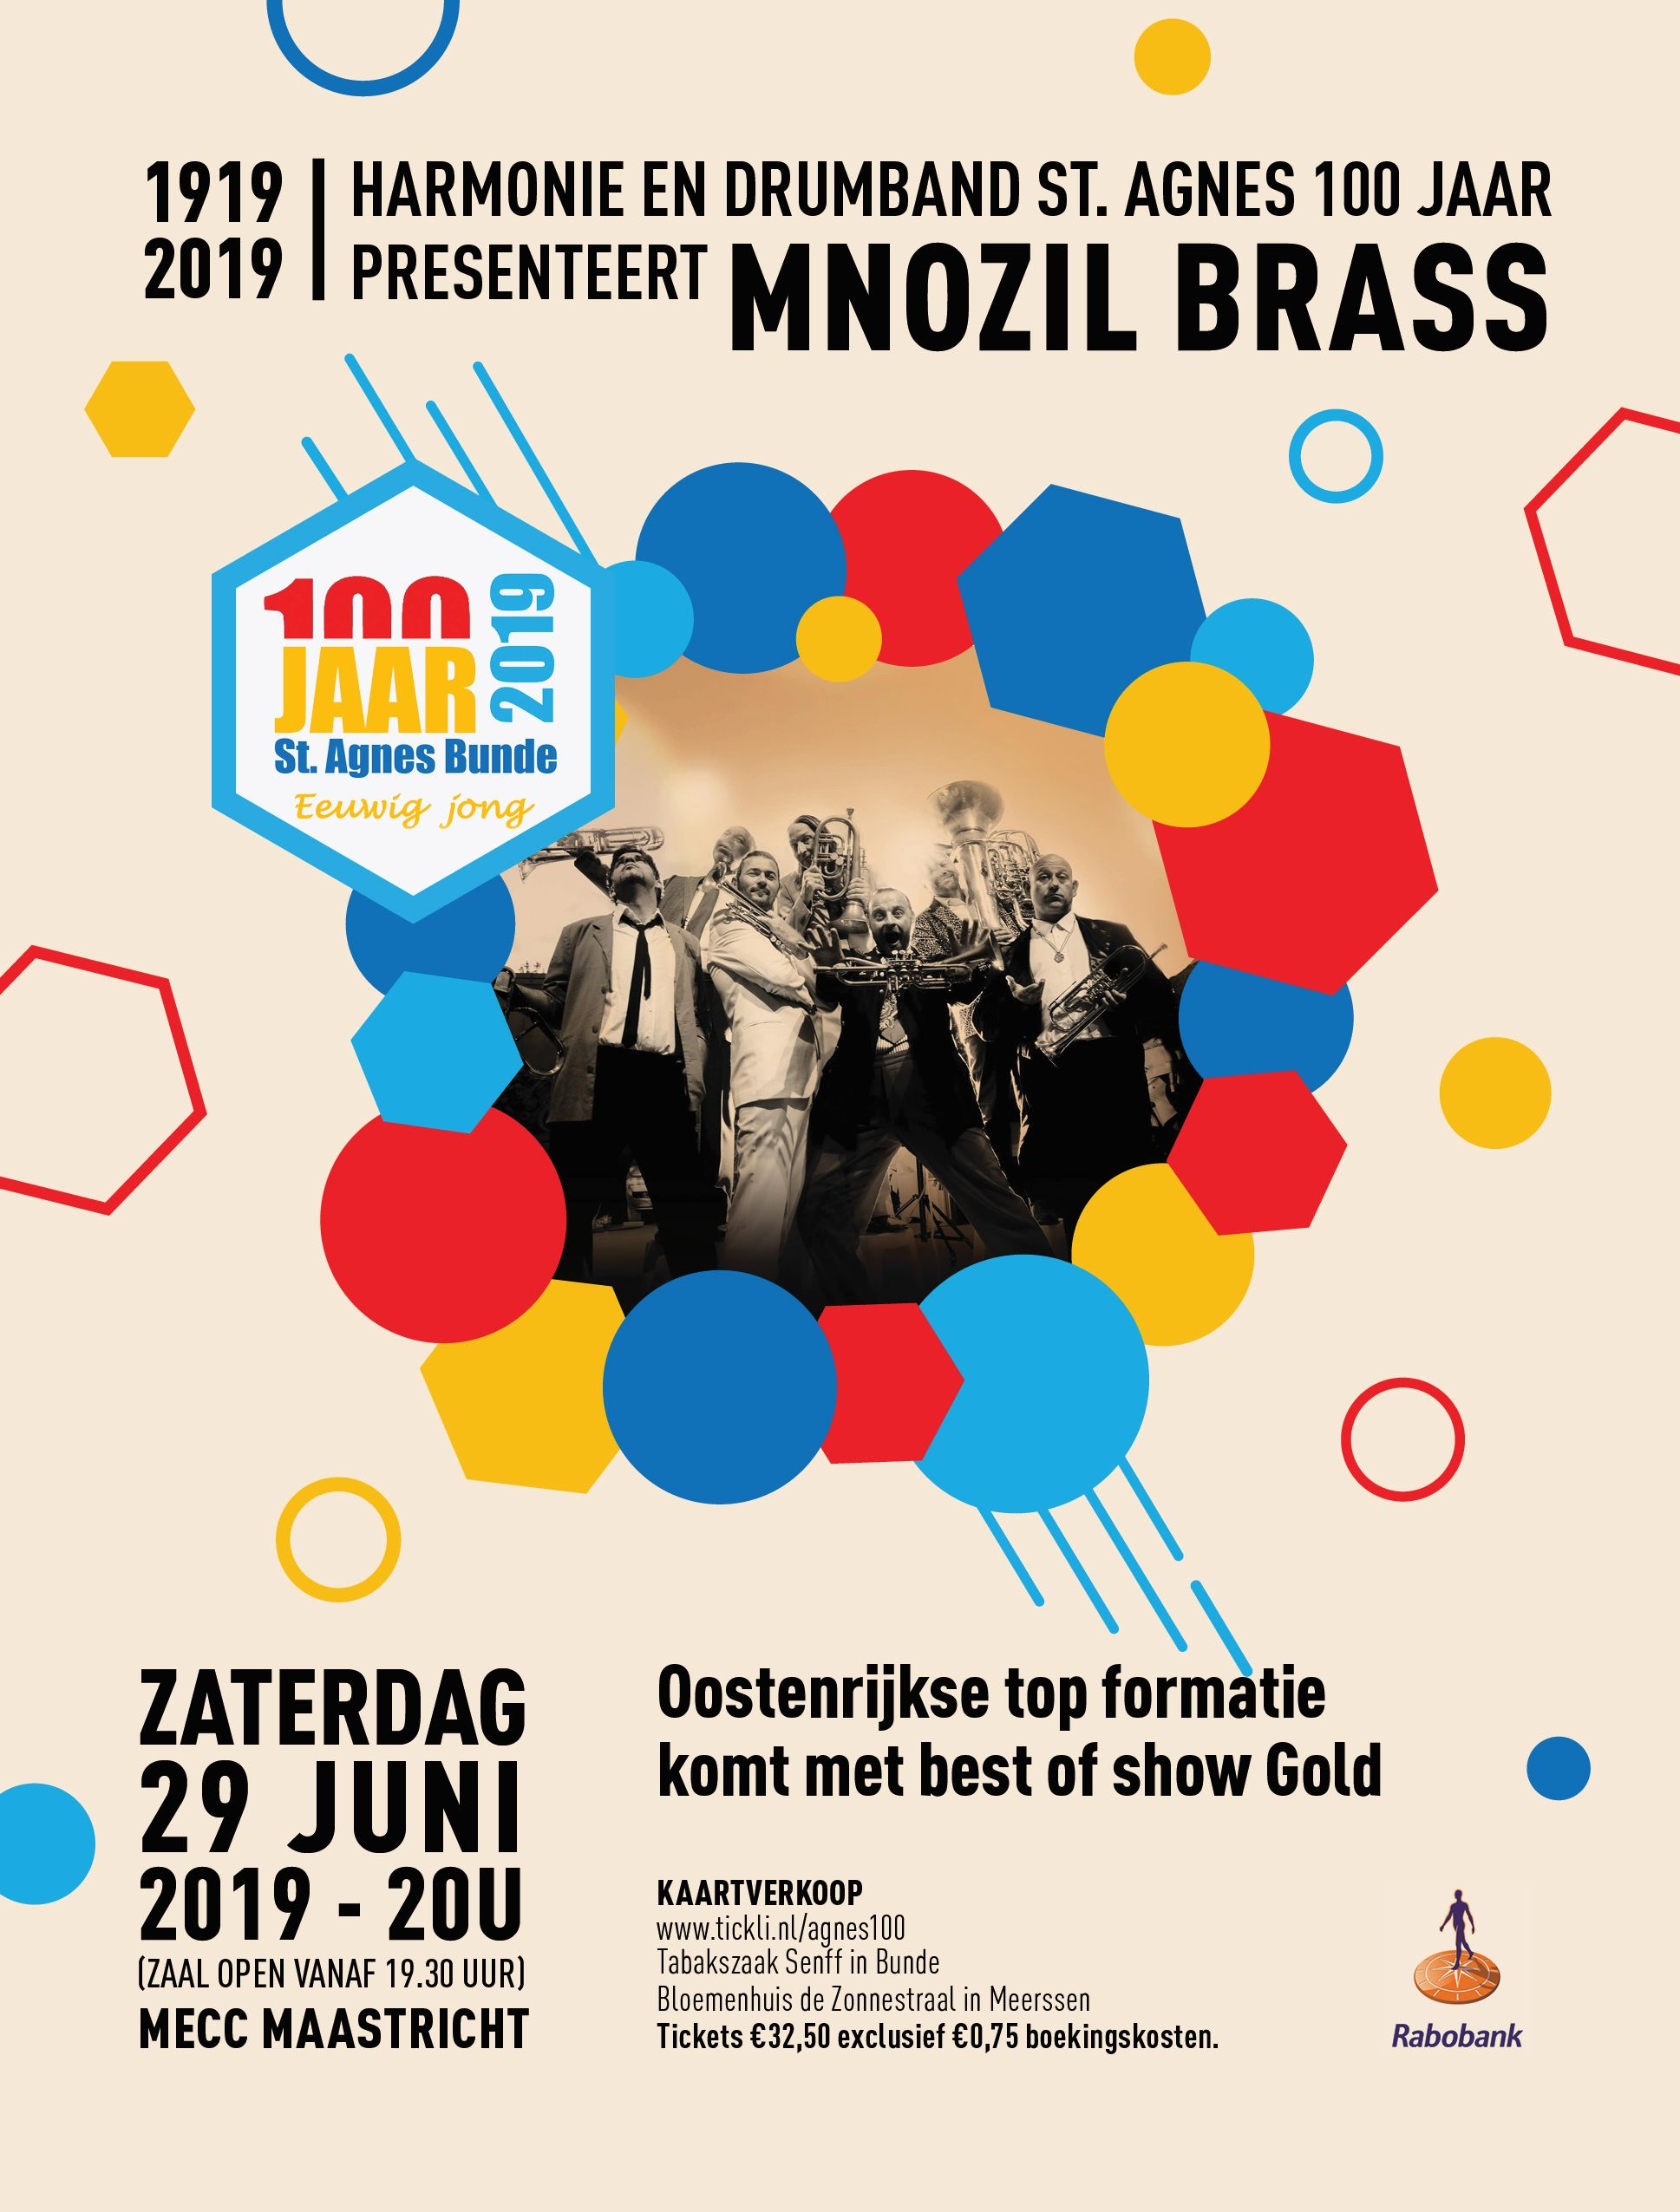 Mnozill Brass Maastricht 25 maart - 15 april